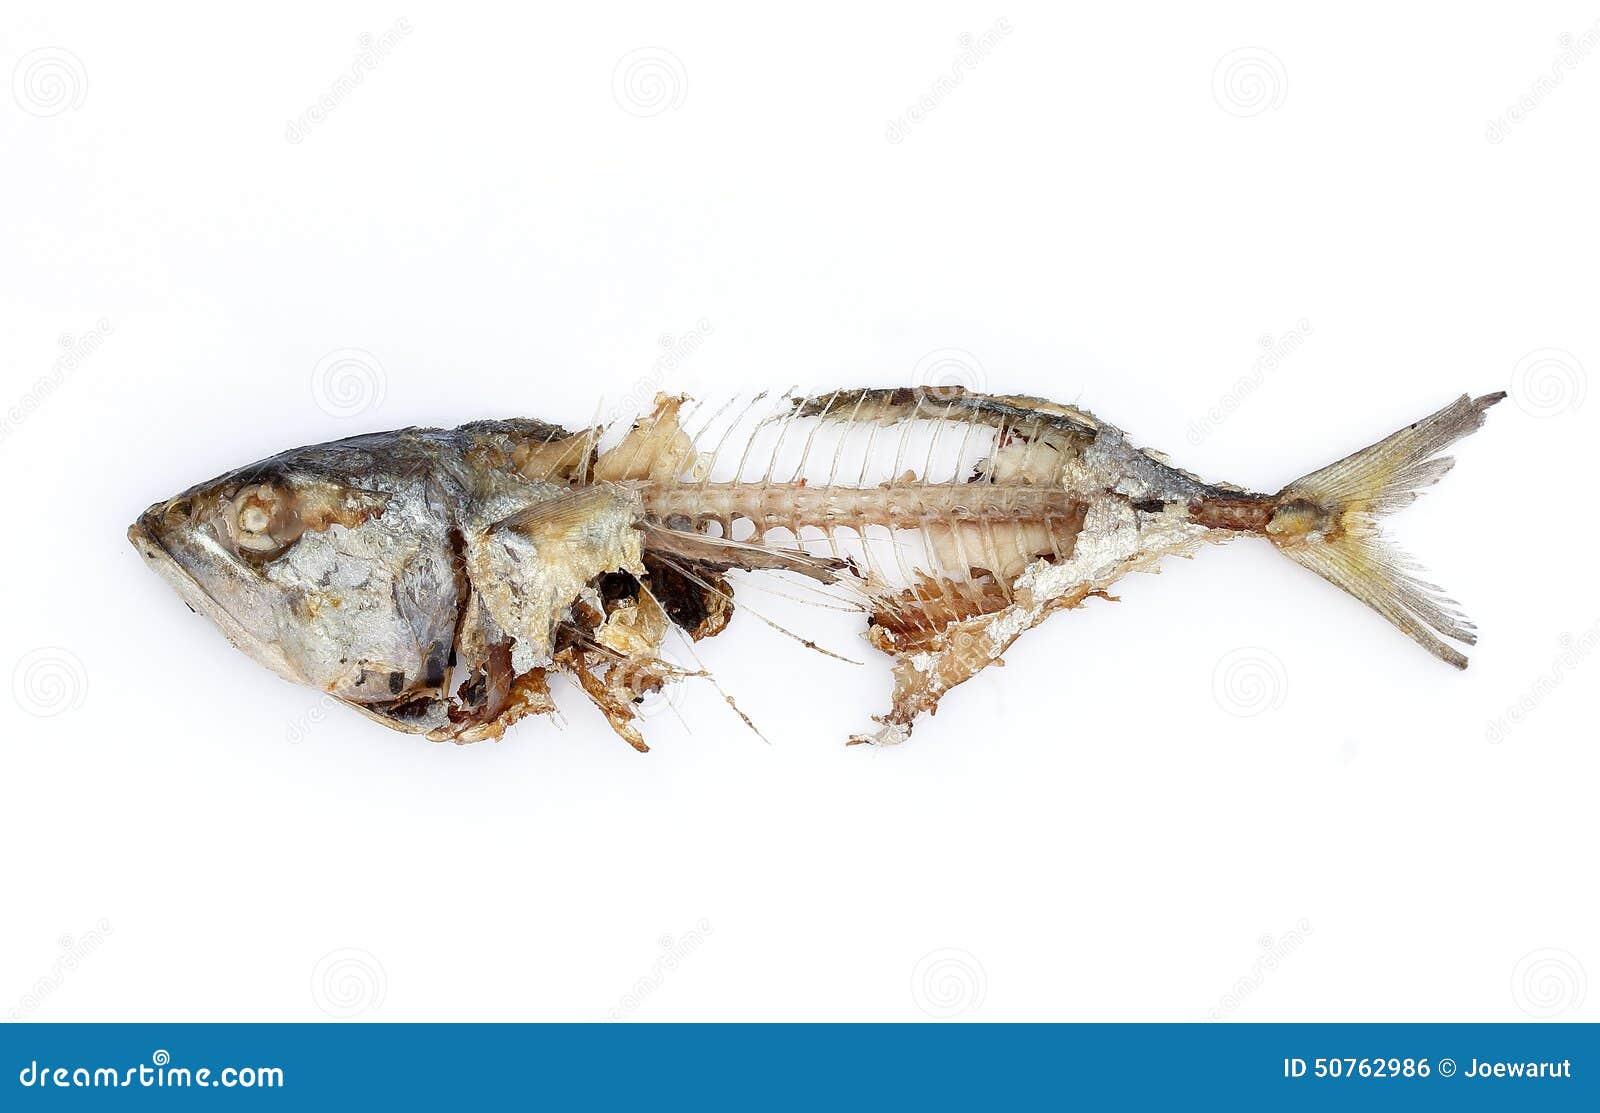 Fish Bone Stock Photo Image 50762986